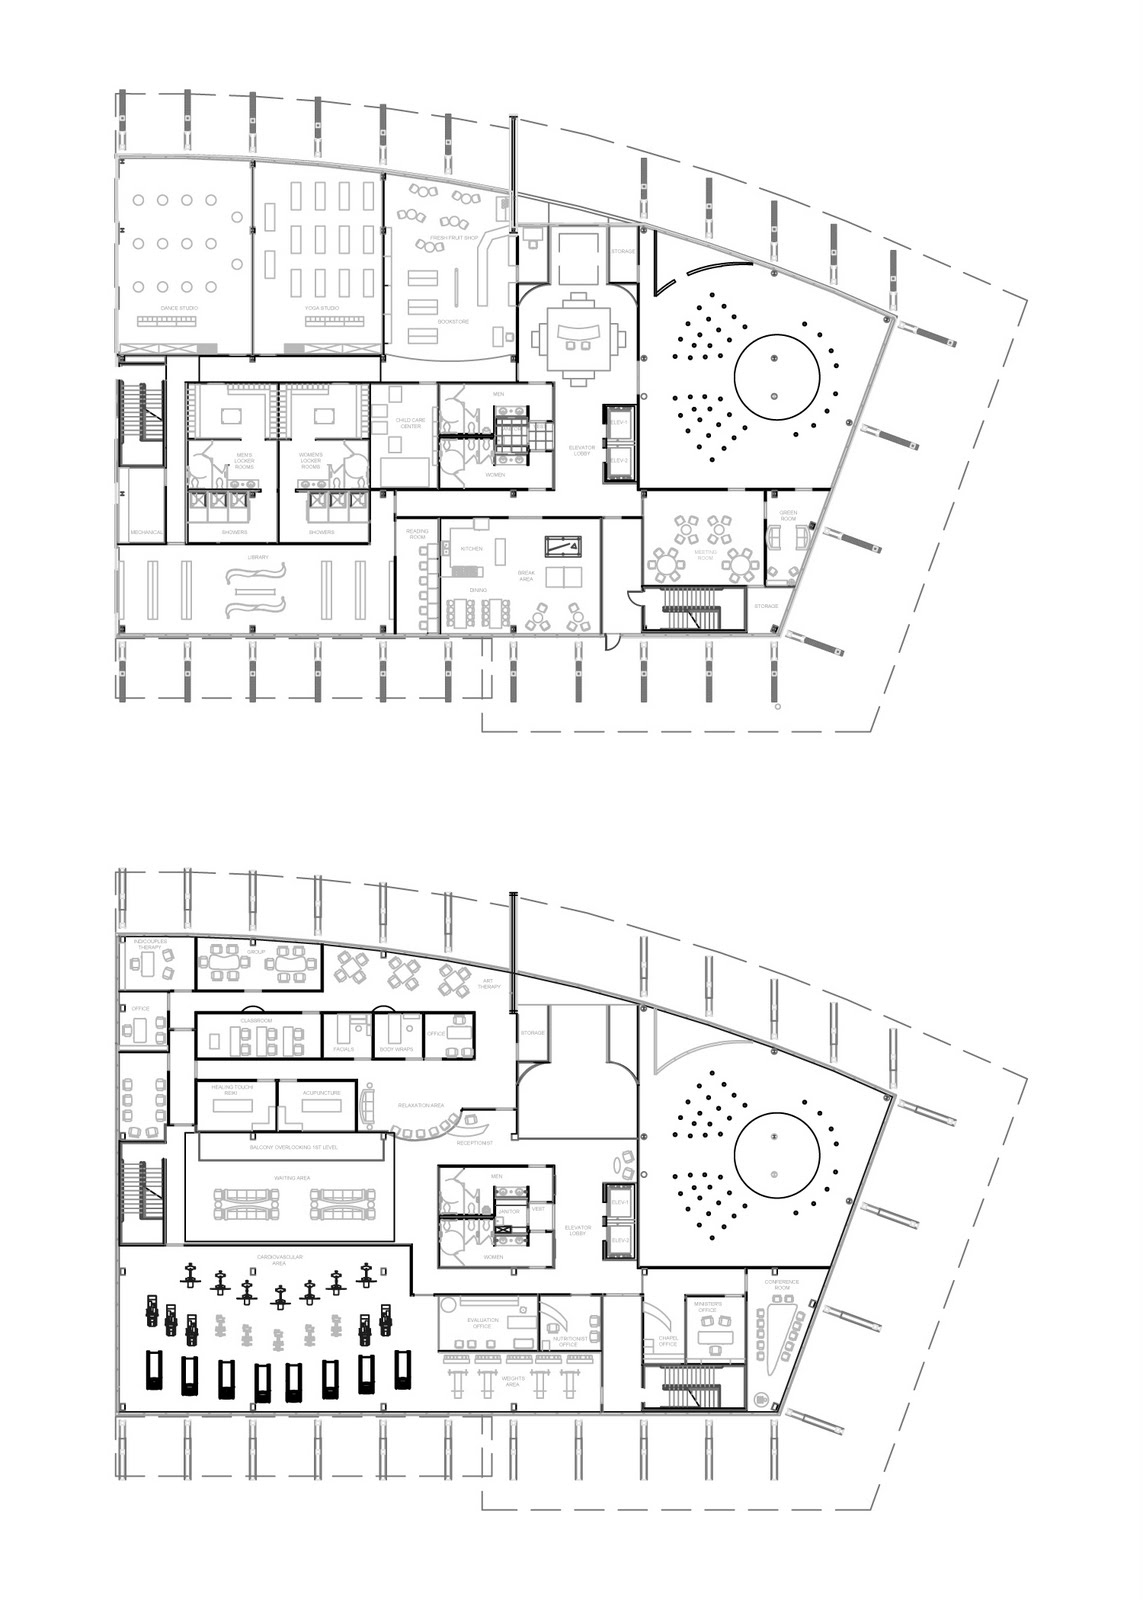 GreenSphere Wellness Center: Revised Reflected Ceiling Plan